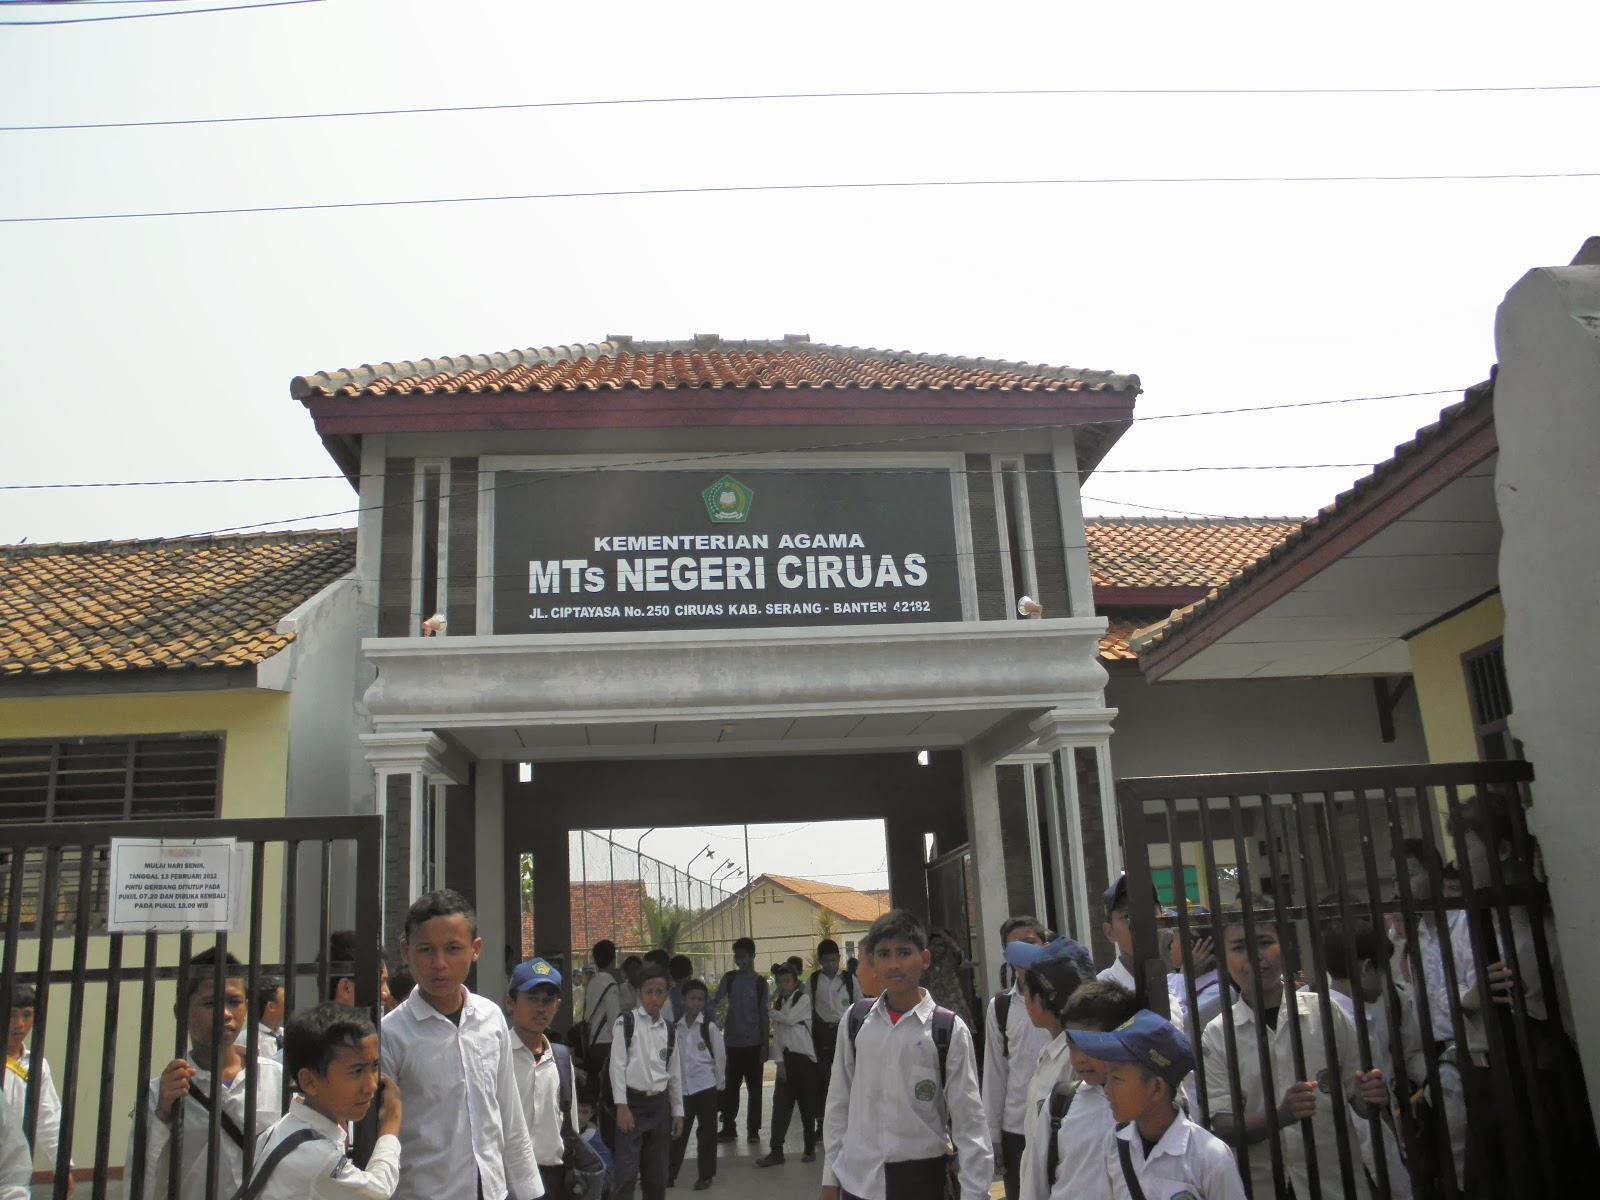 GerbangUtama MTsN ciruas